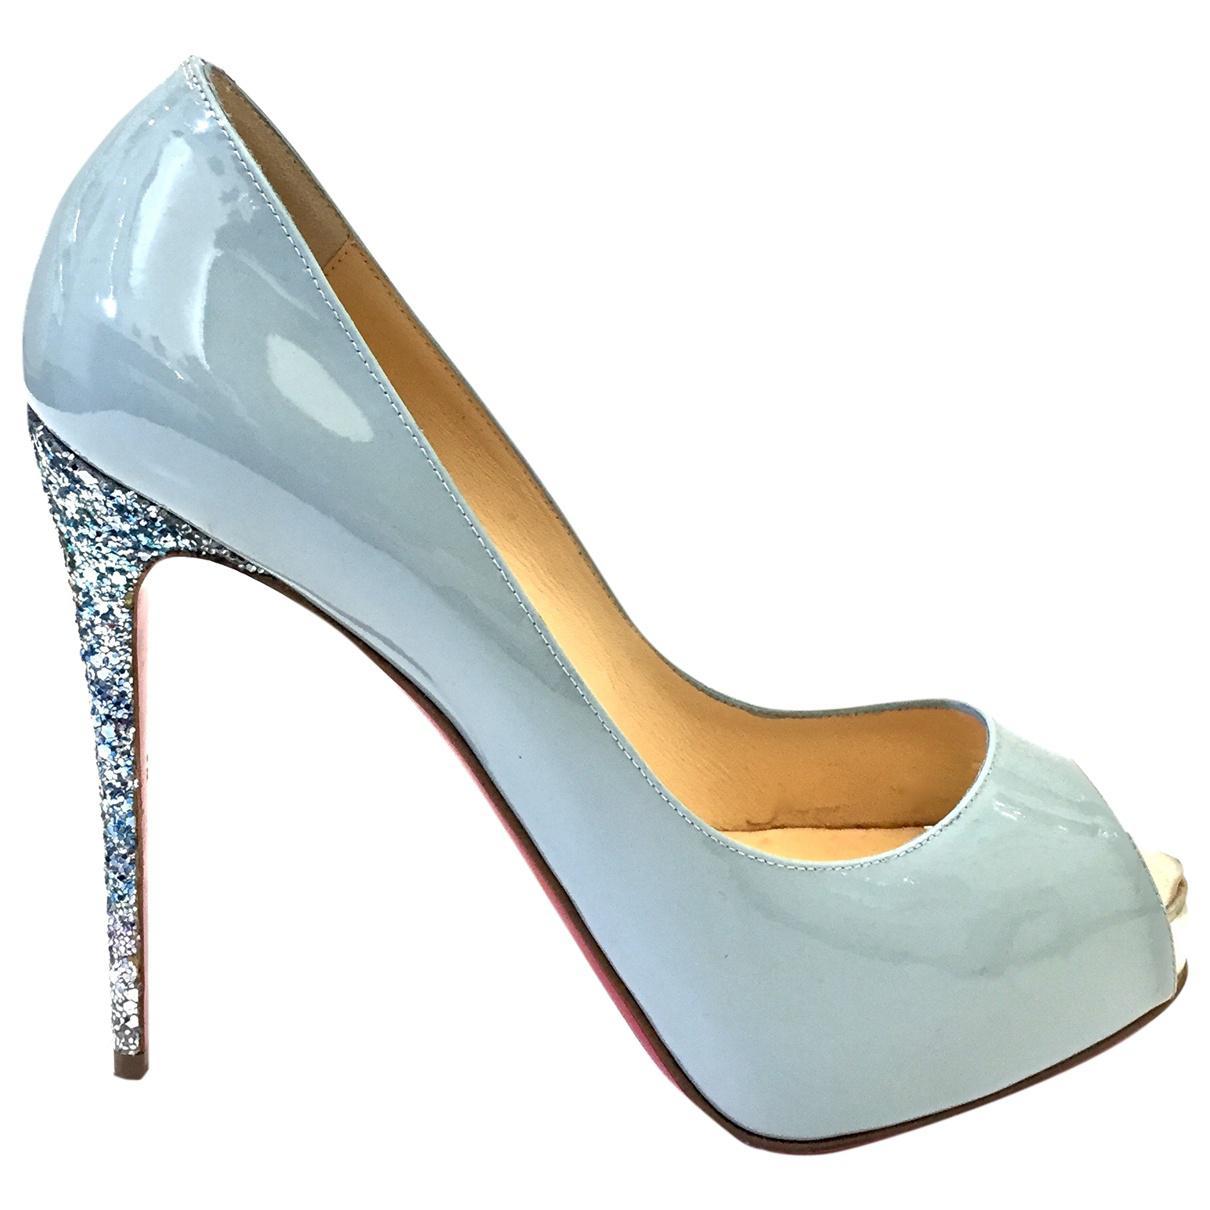 Pre-owned - Lady Peep heels Christian Louboutin KgmlnI